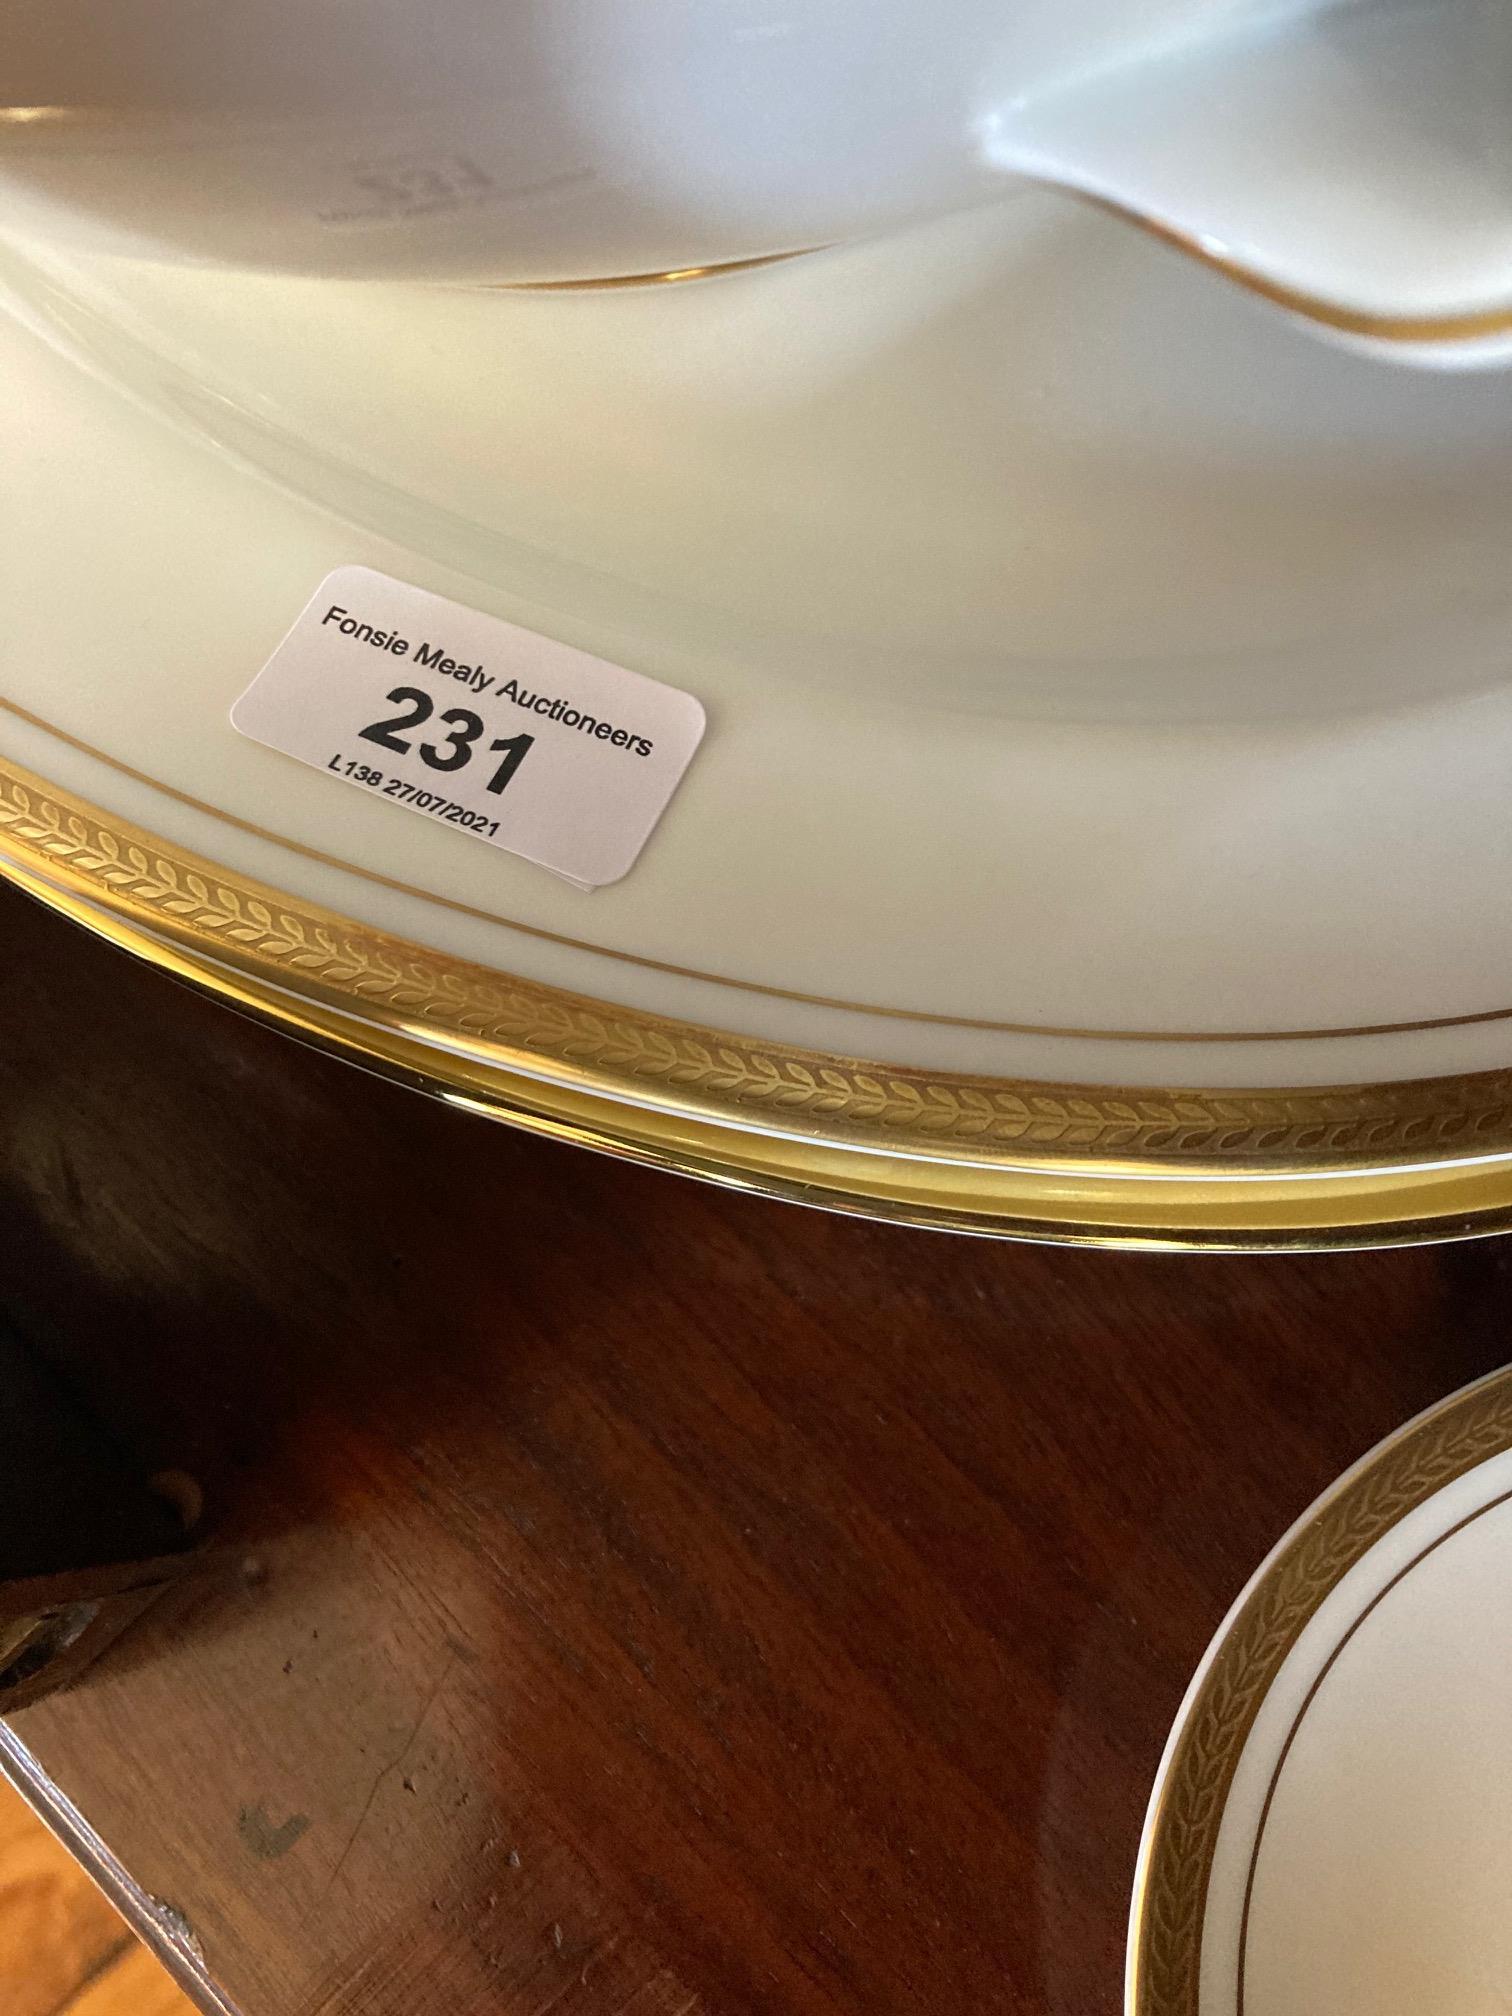 A fine Belleek Presentation Dinner, Tea, Coffee Service By Aynsley - Image 5 of 7